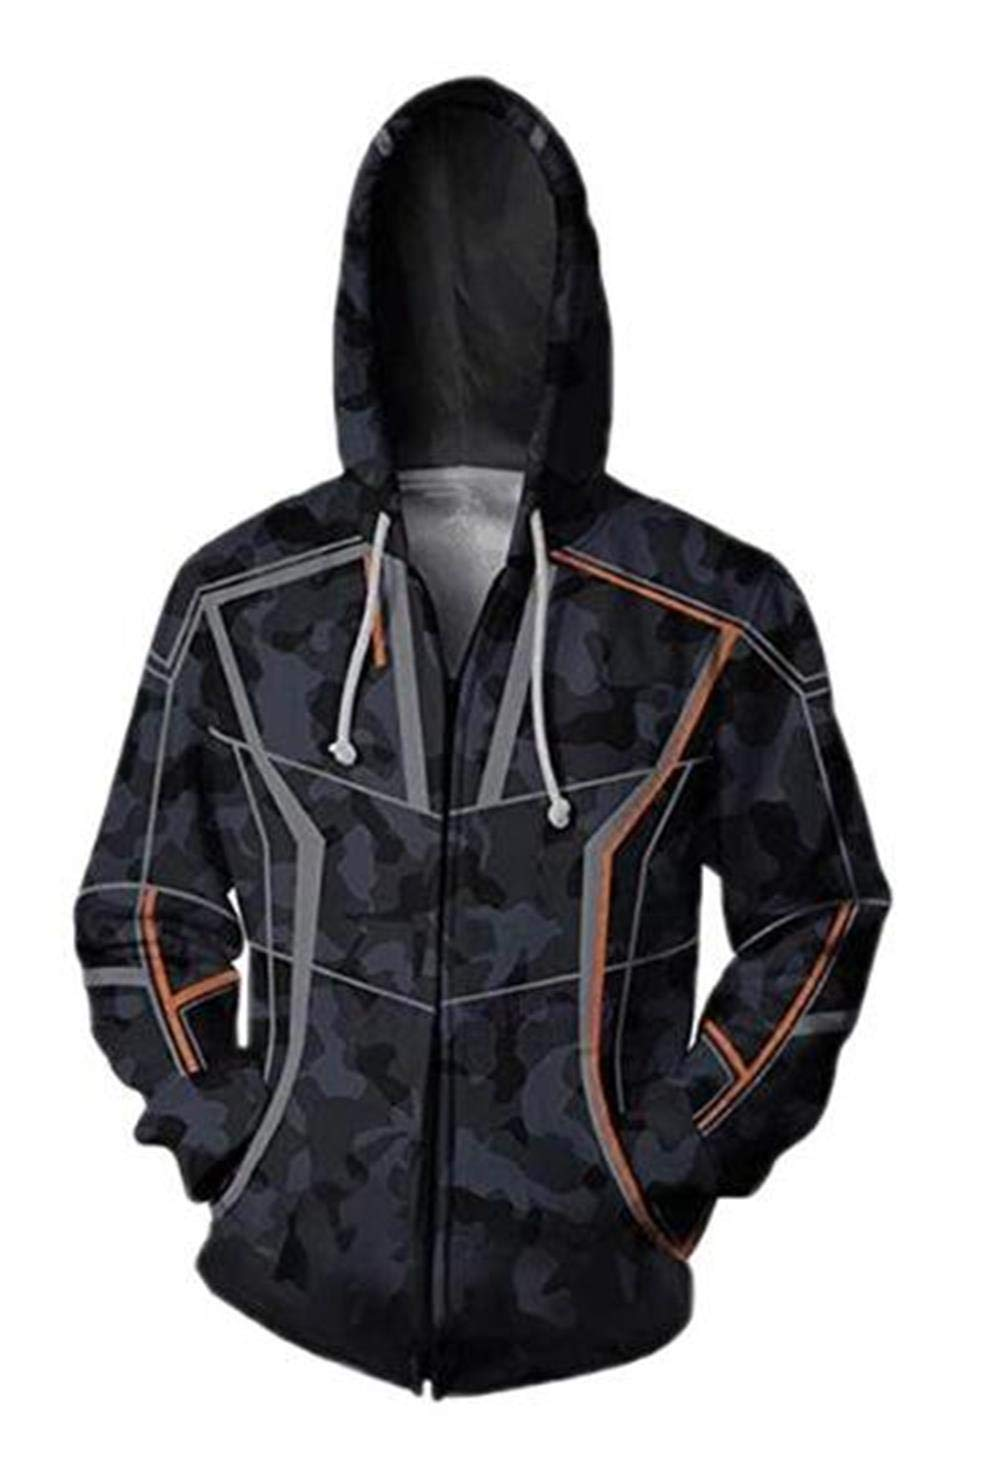 Unisex Superhero Cosplay Costume Cotton Fleece Hoodie Jacket with Zipper